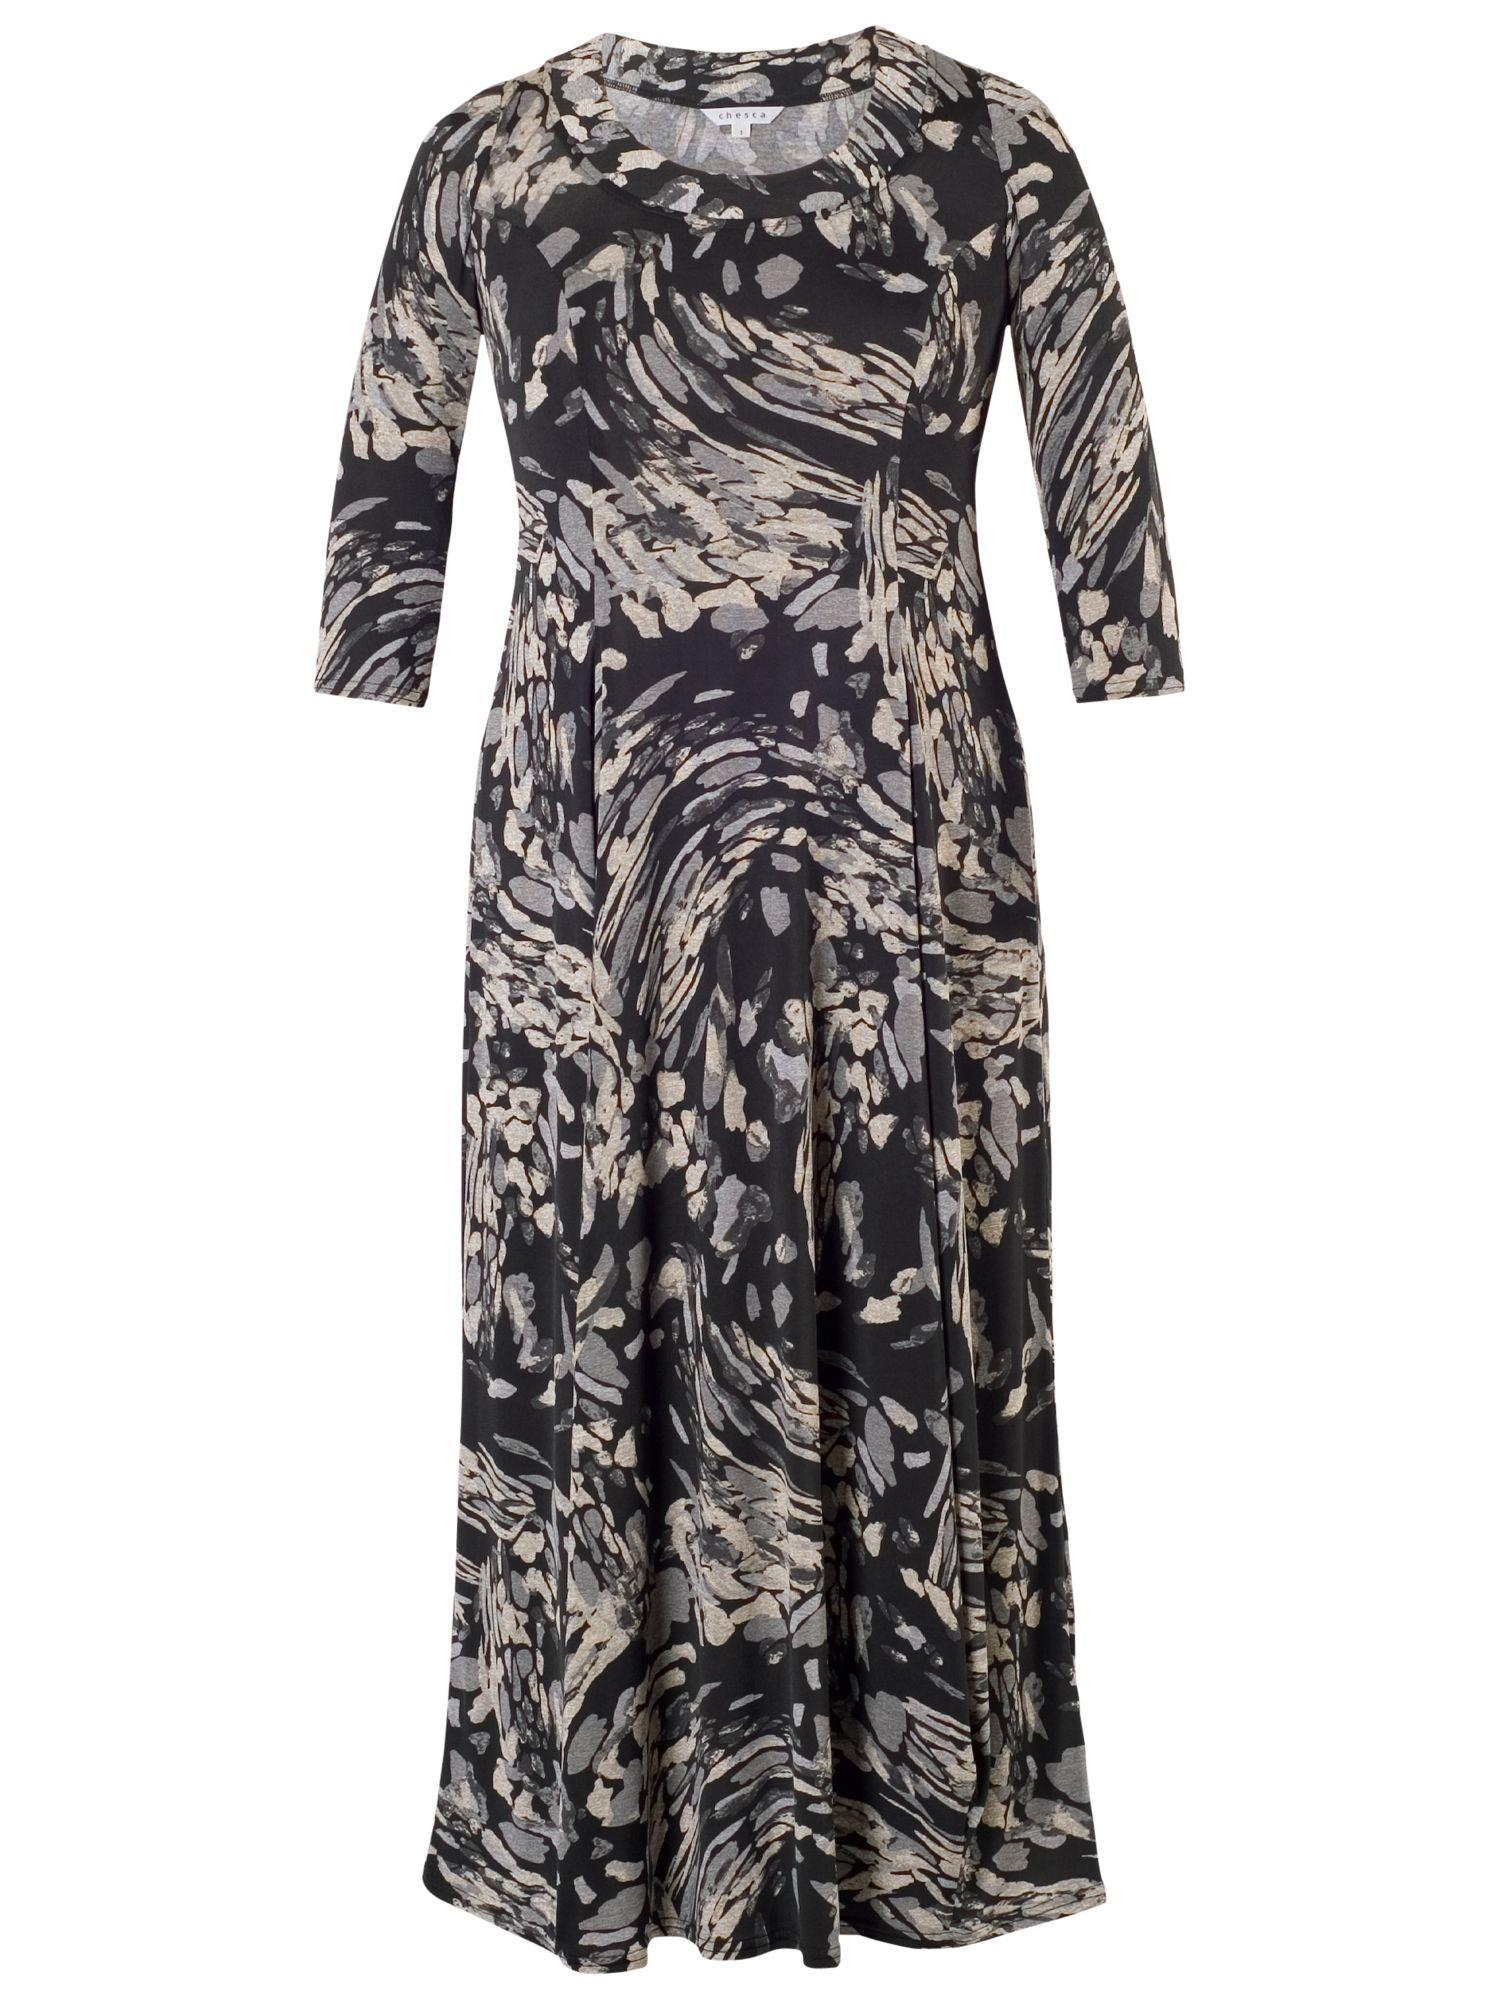 chesca steel print draped jersey dress grey, chesca, steel, print, draped, jersey, dress, grey, 12-14|24-26|20-22|16-18, women, plus size, womens dresses, 1774269